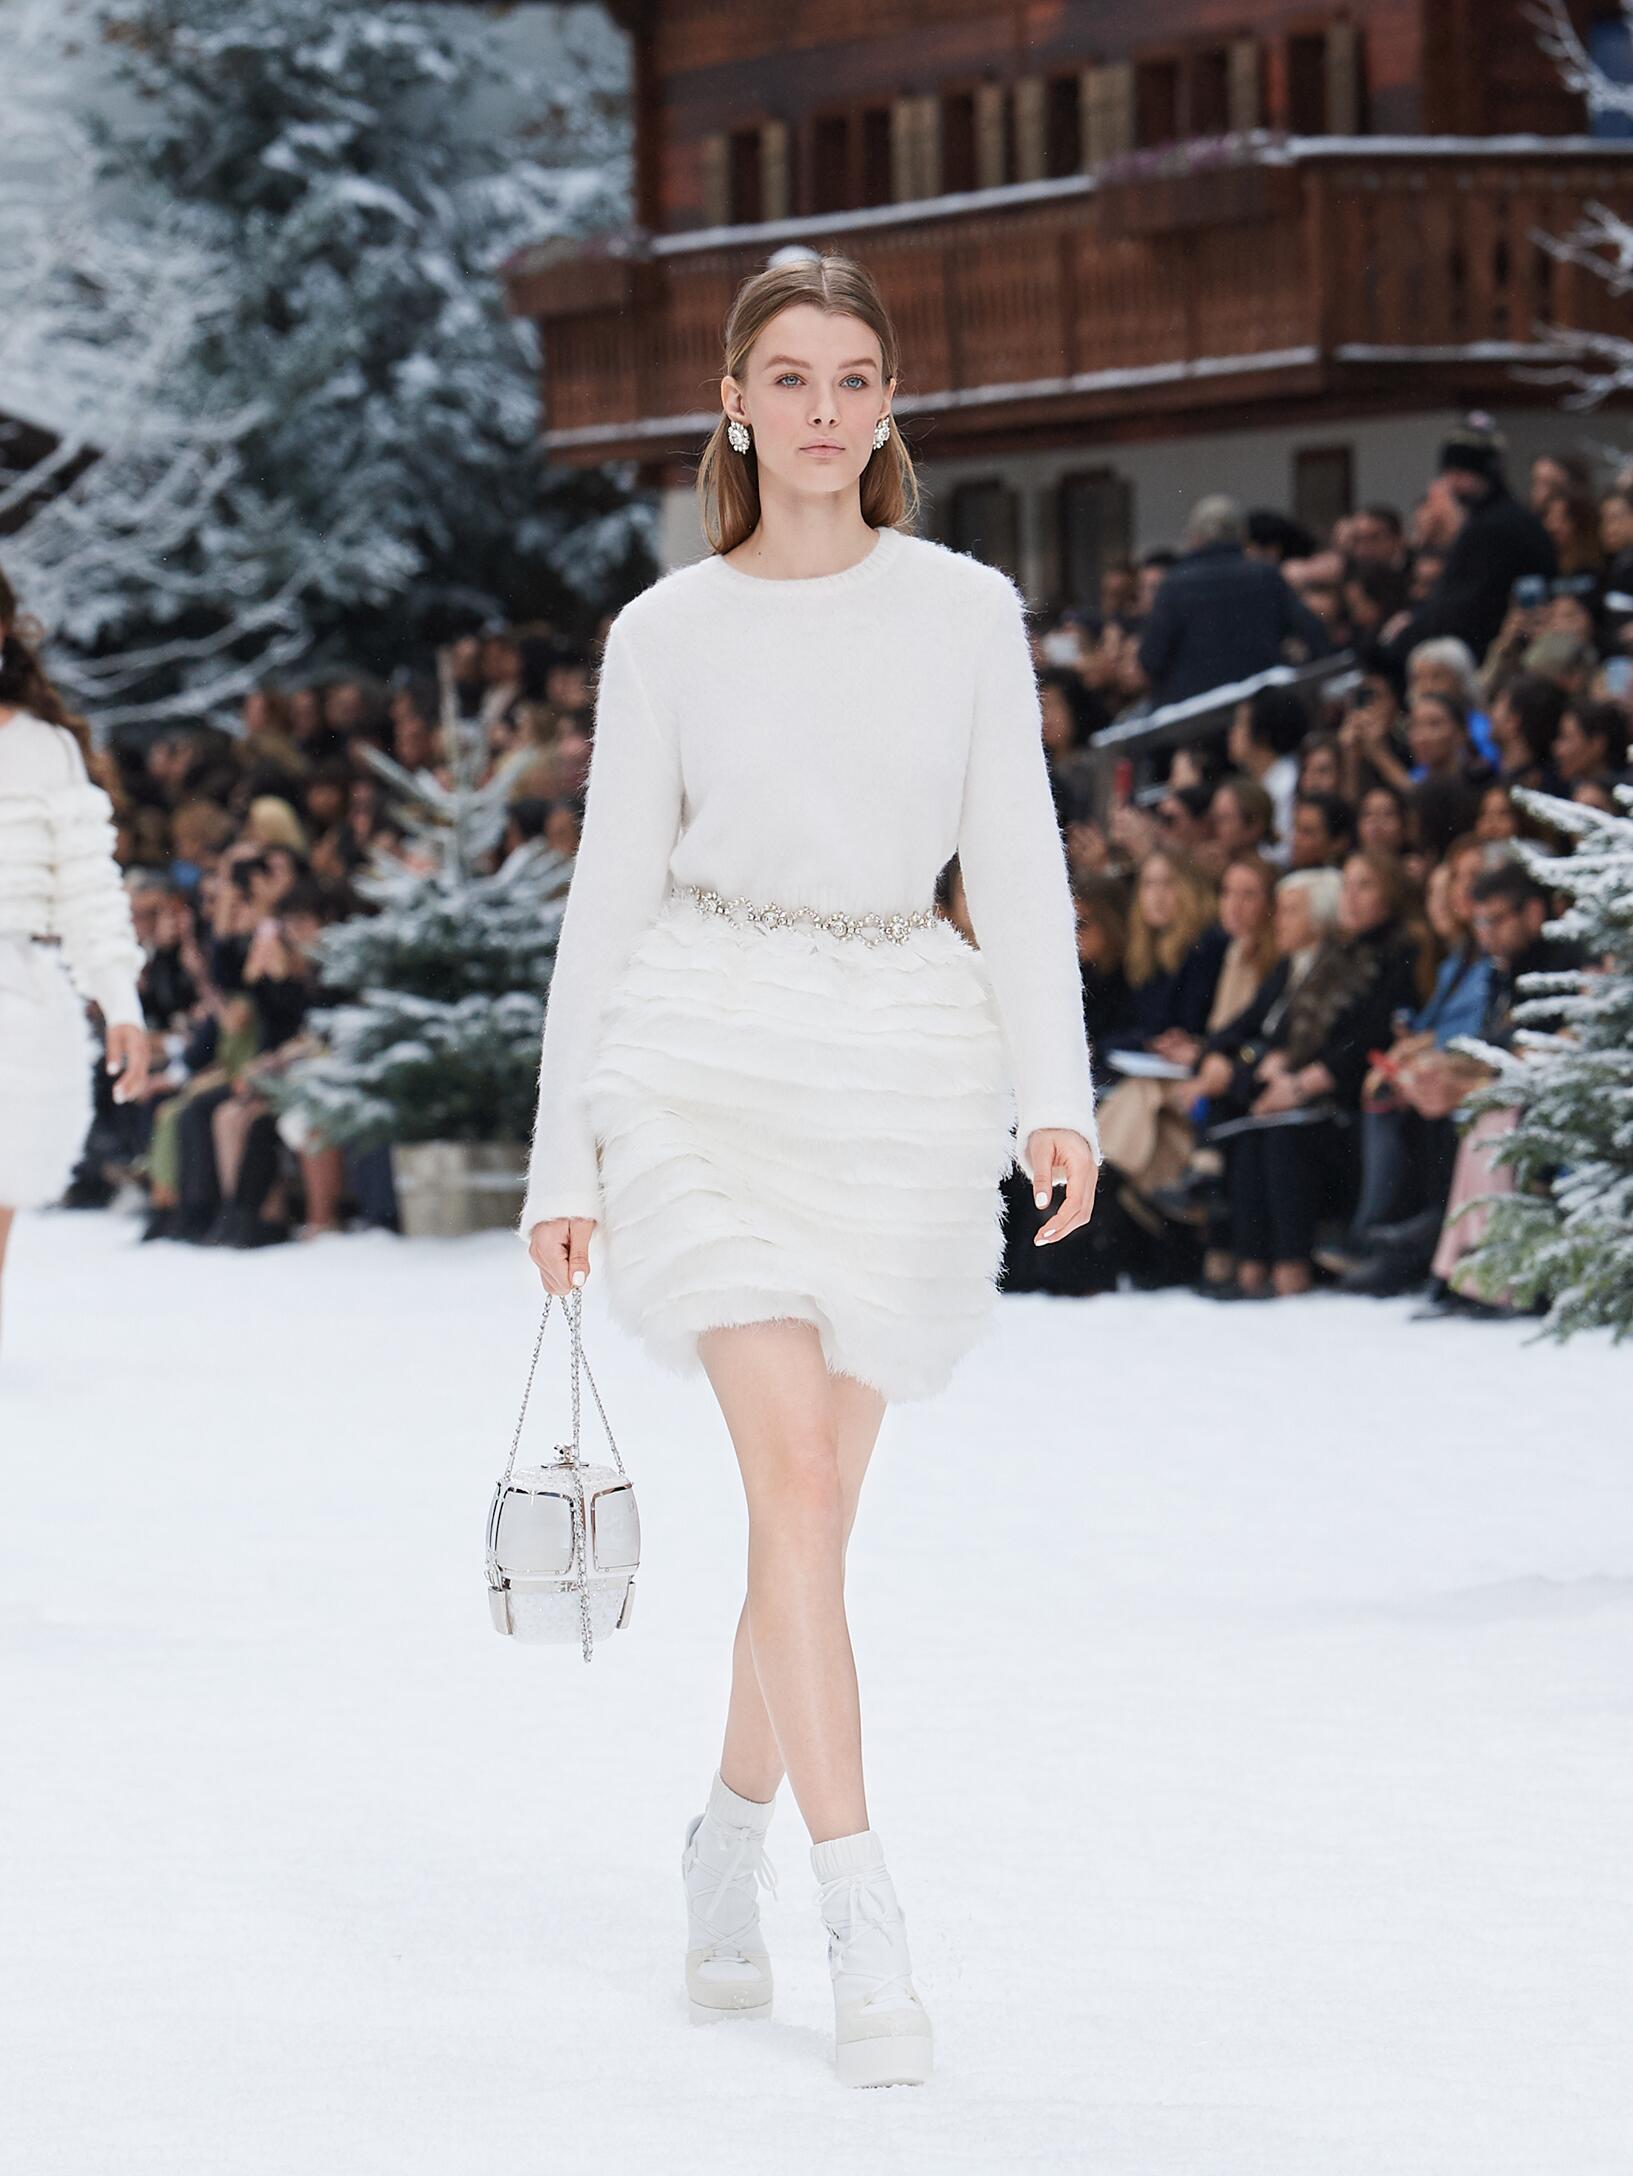 2019 Chanel FW Runway Show